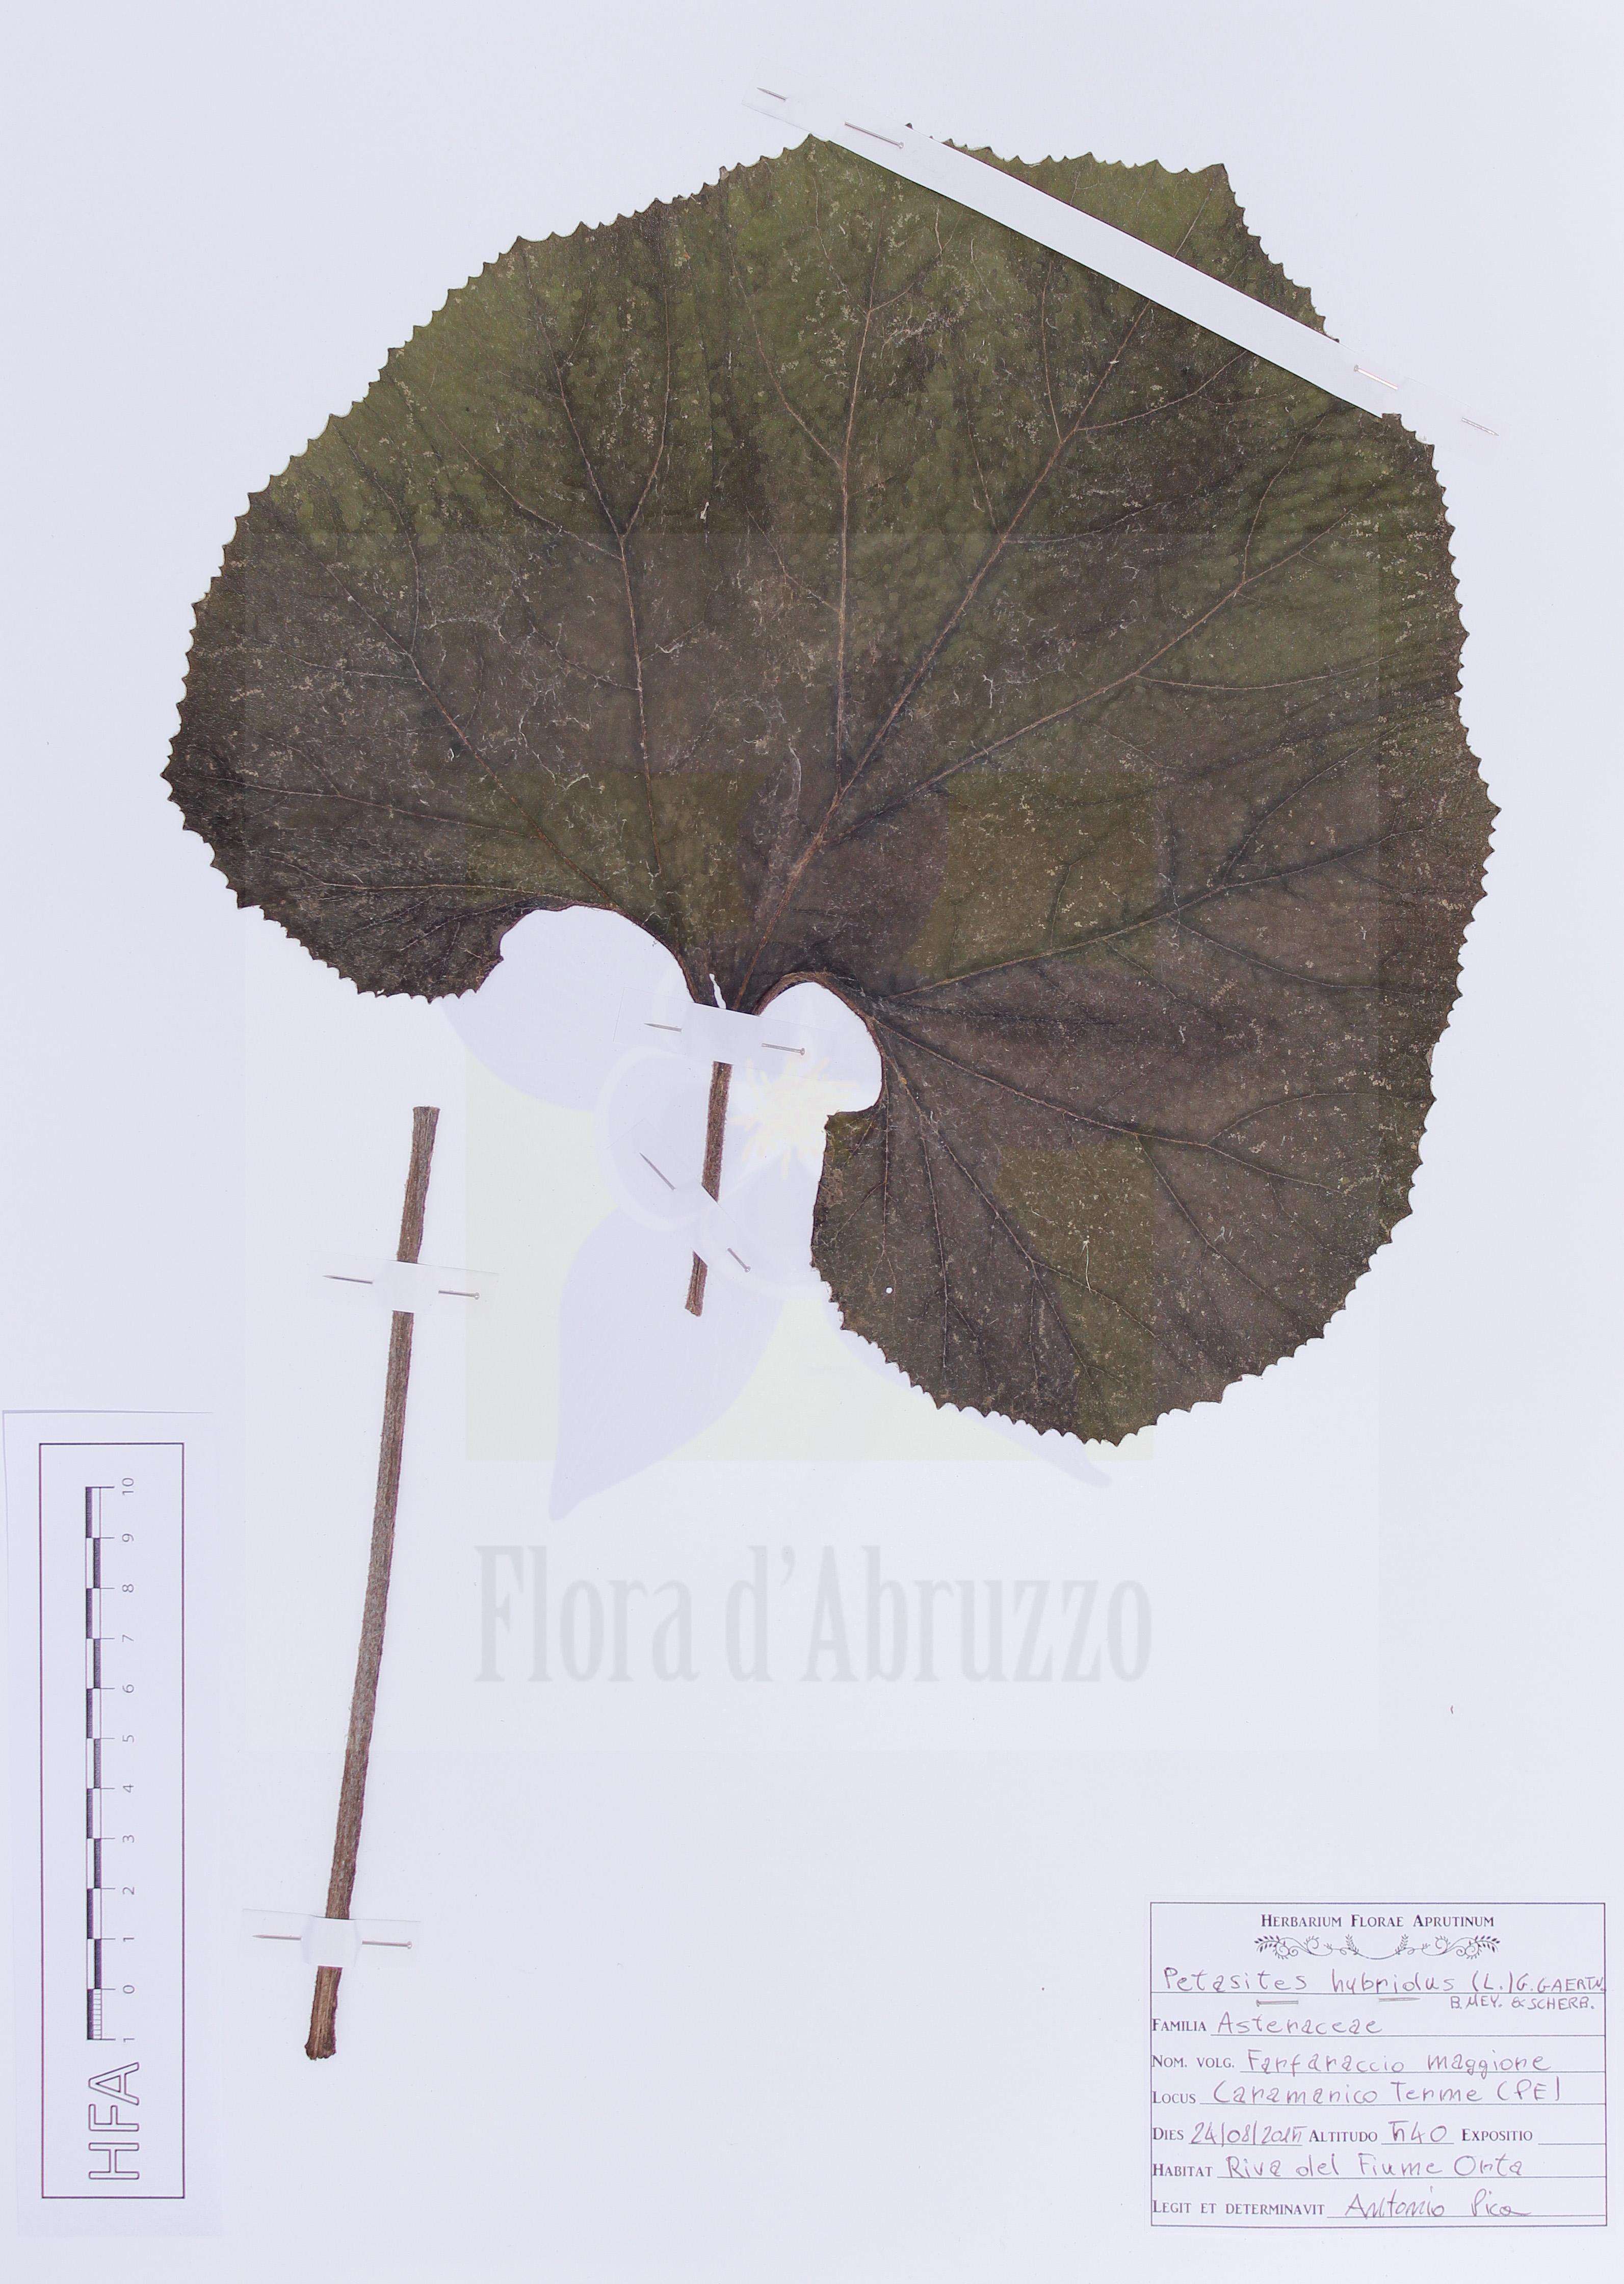 Petasites hybridus(L.) G. Gaertn., B. Mey. & Scherb.